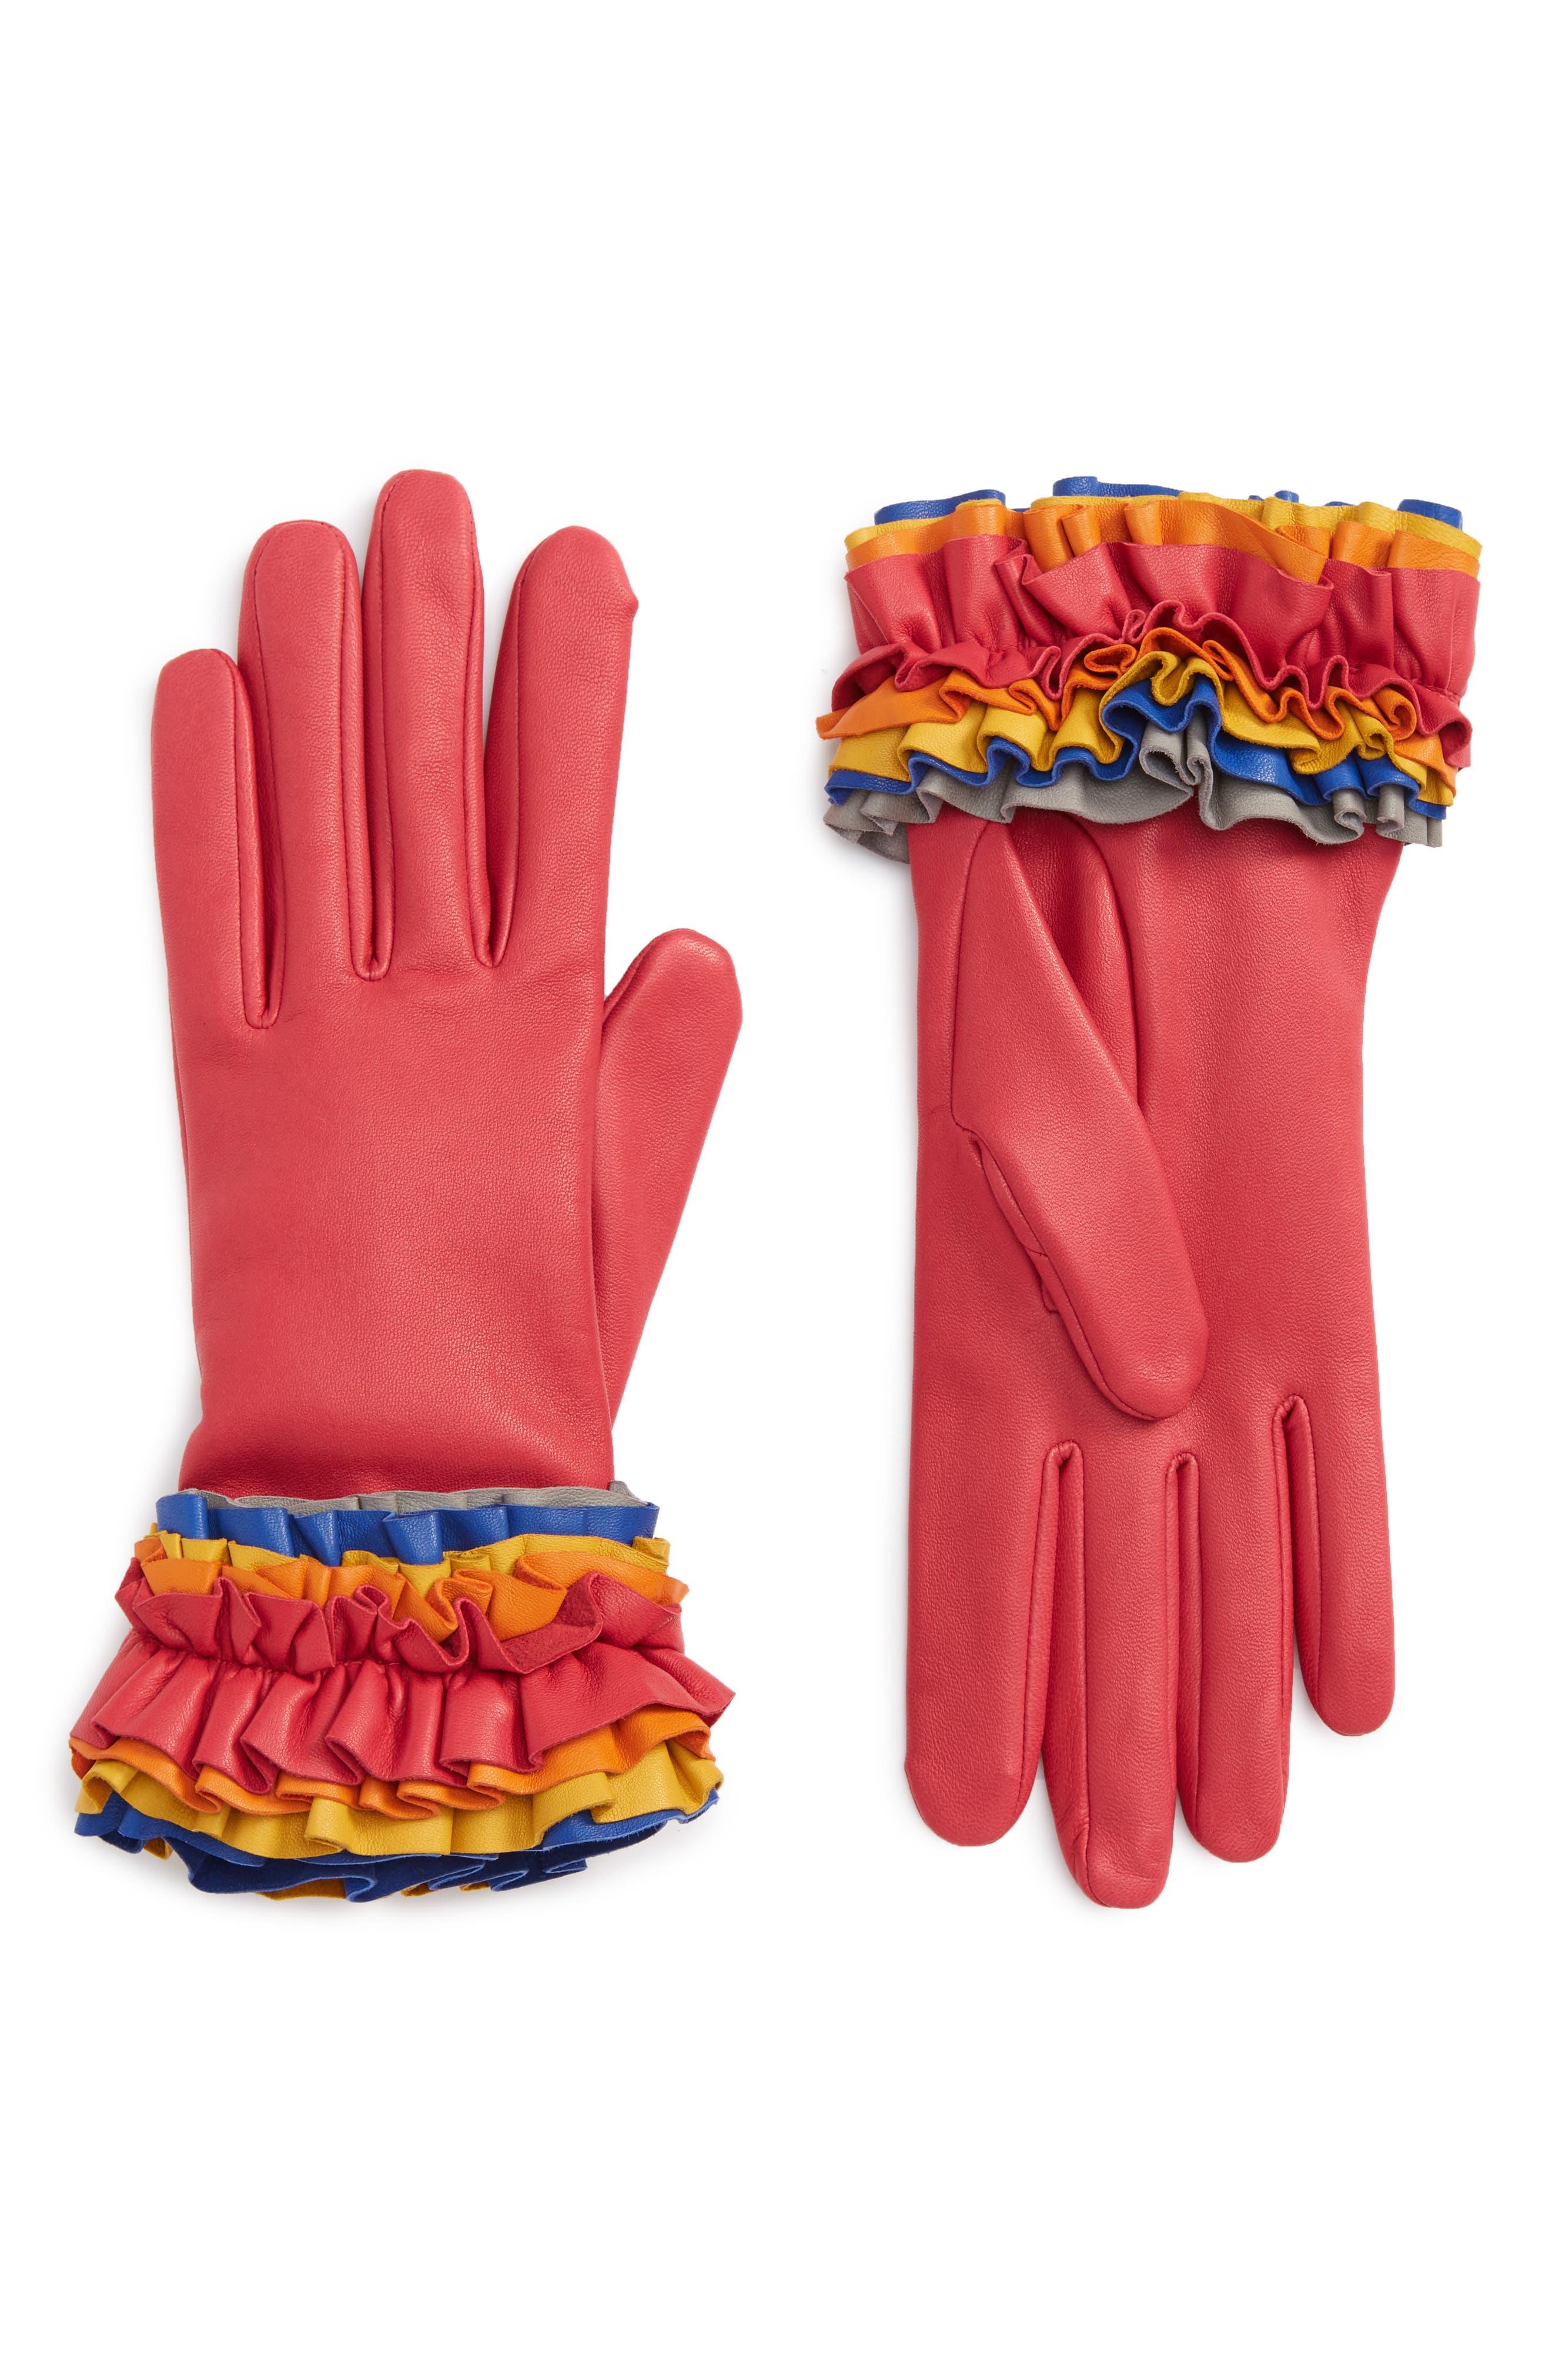 Alternate Image 1 Selected - Agnelle Ruffle Lambskin Leather Gloves